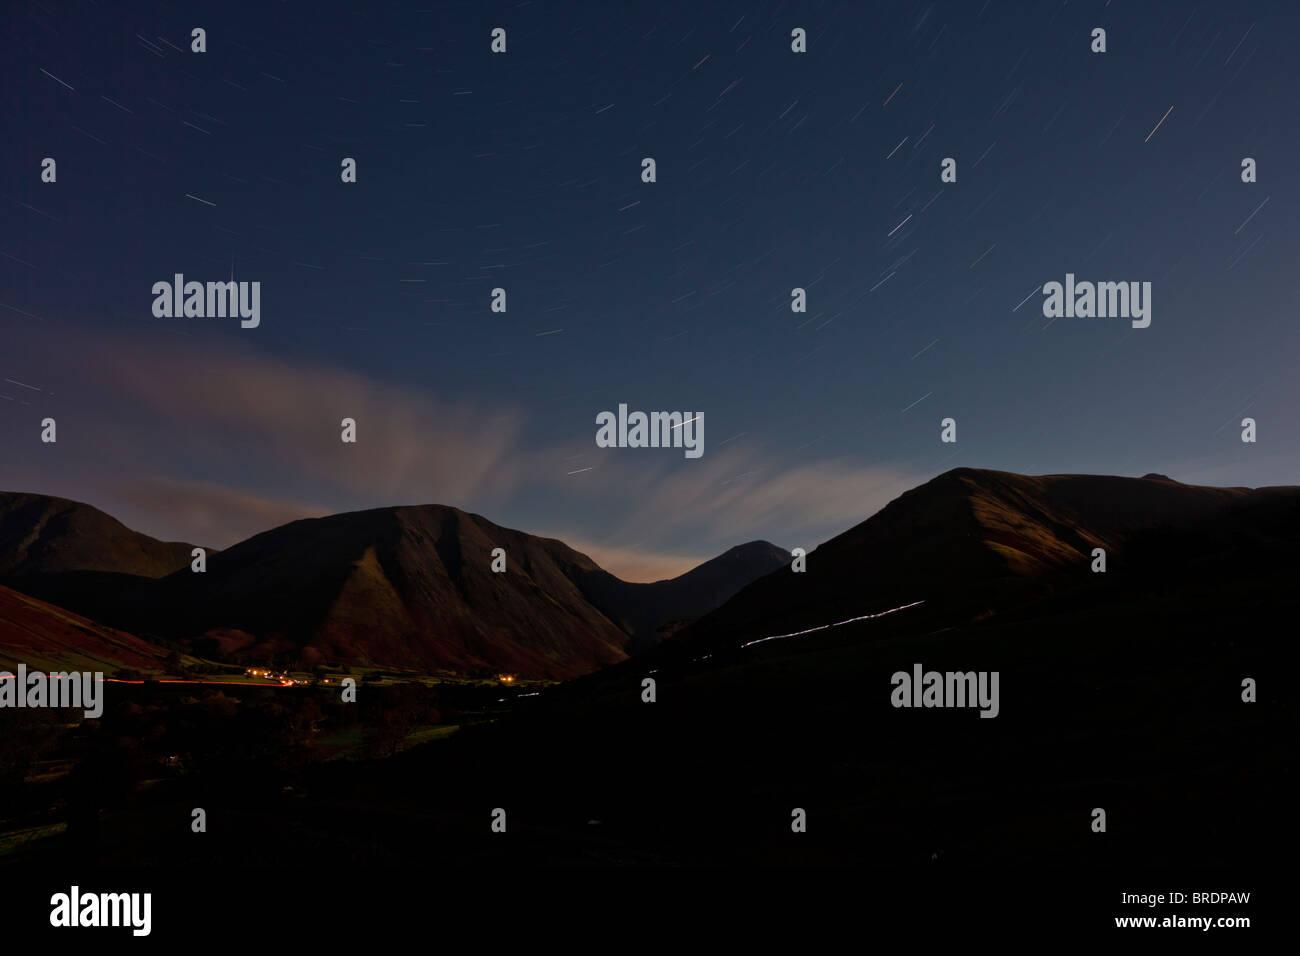 Wasdale Head at night, Cumbria - Stock Image